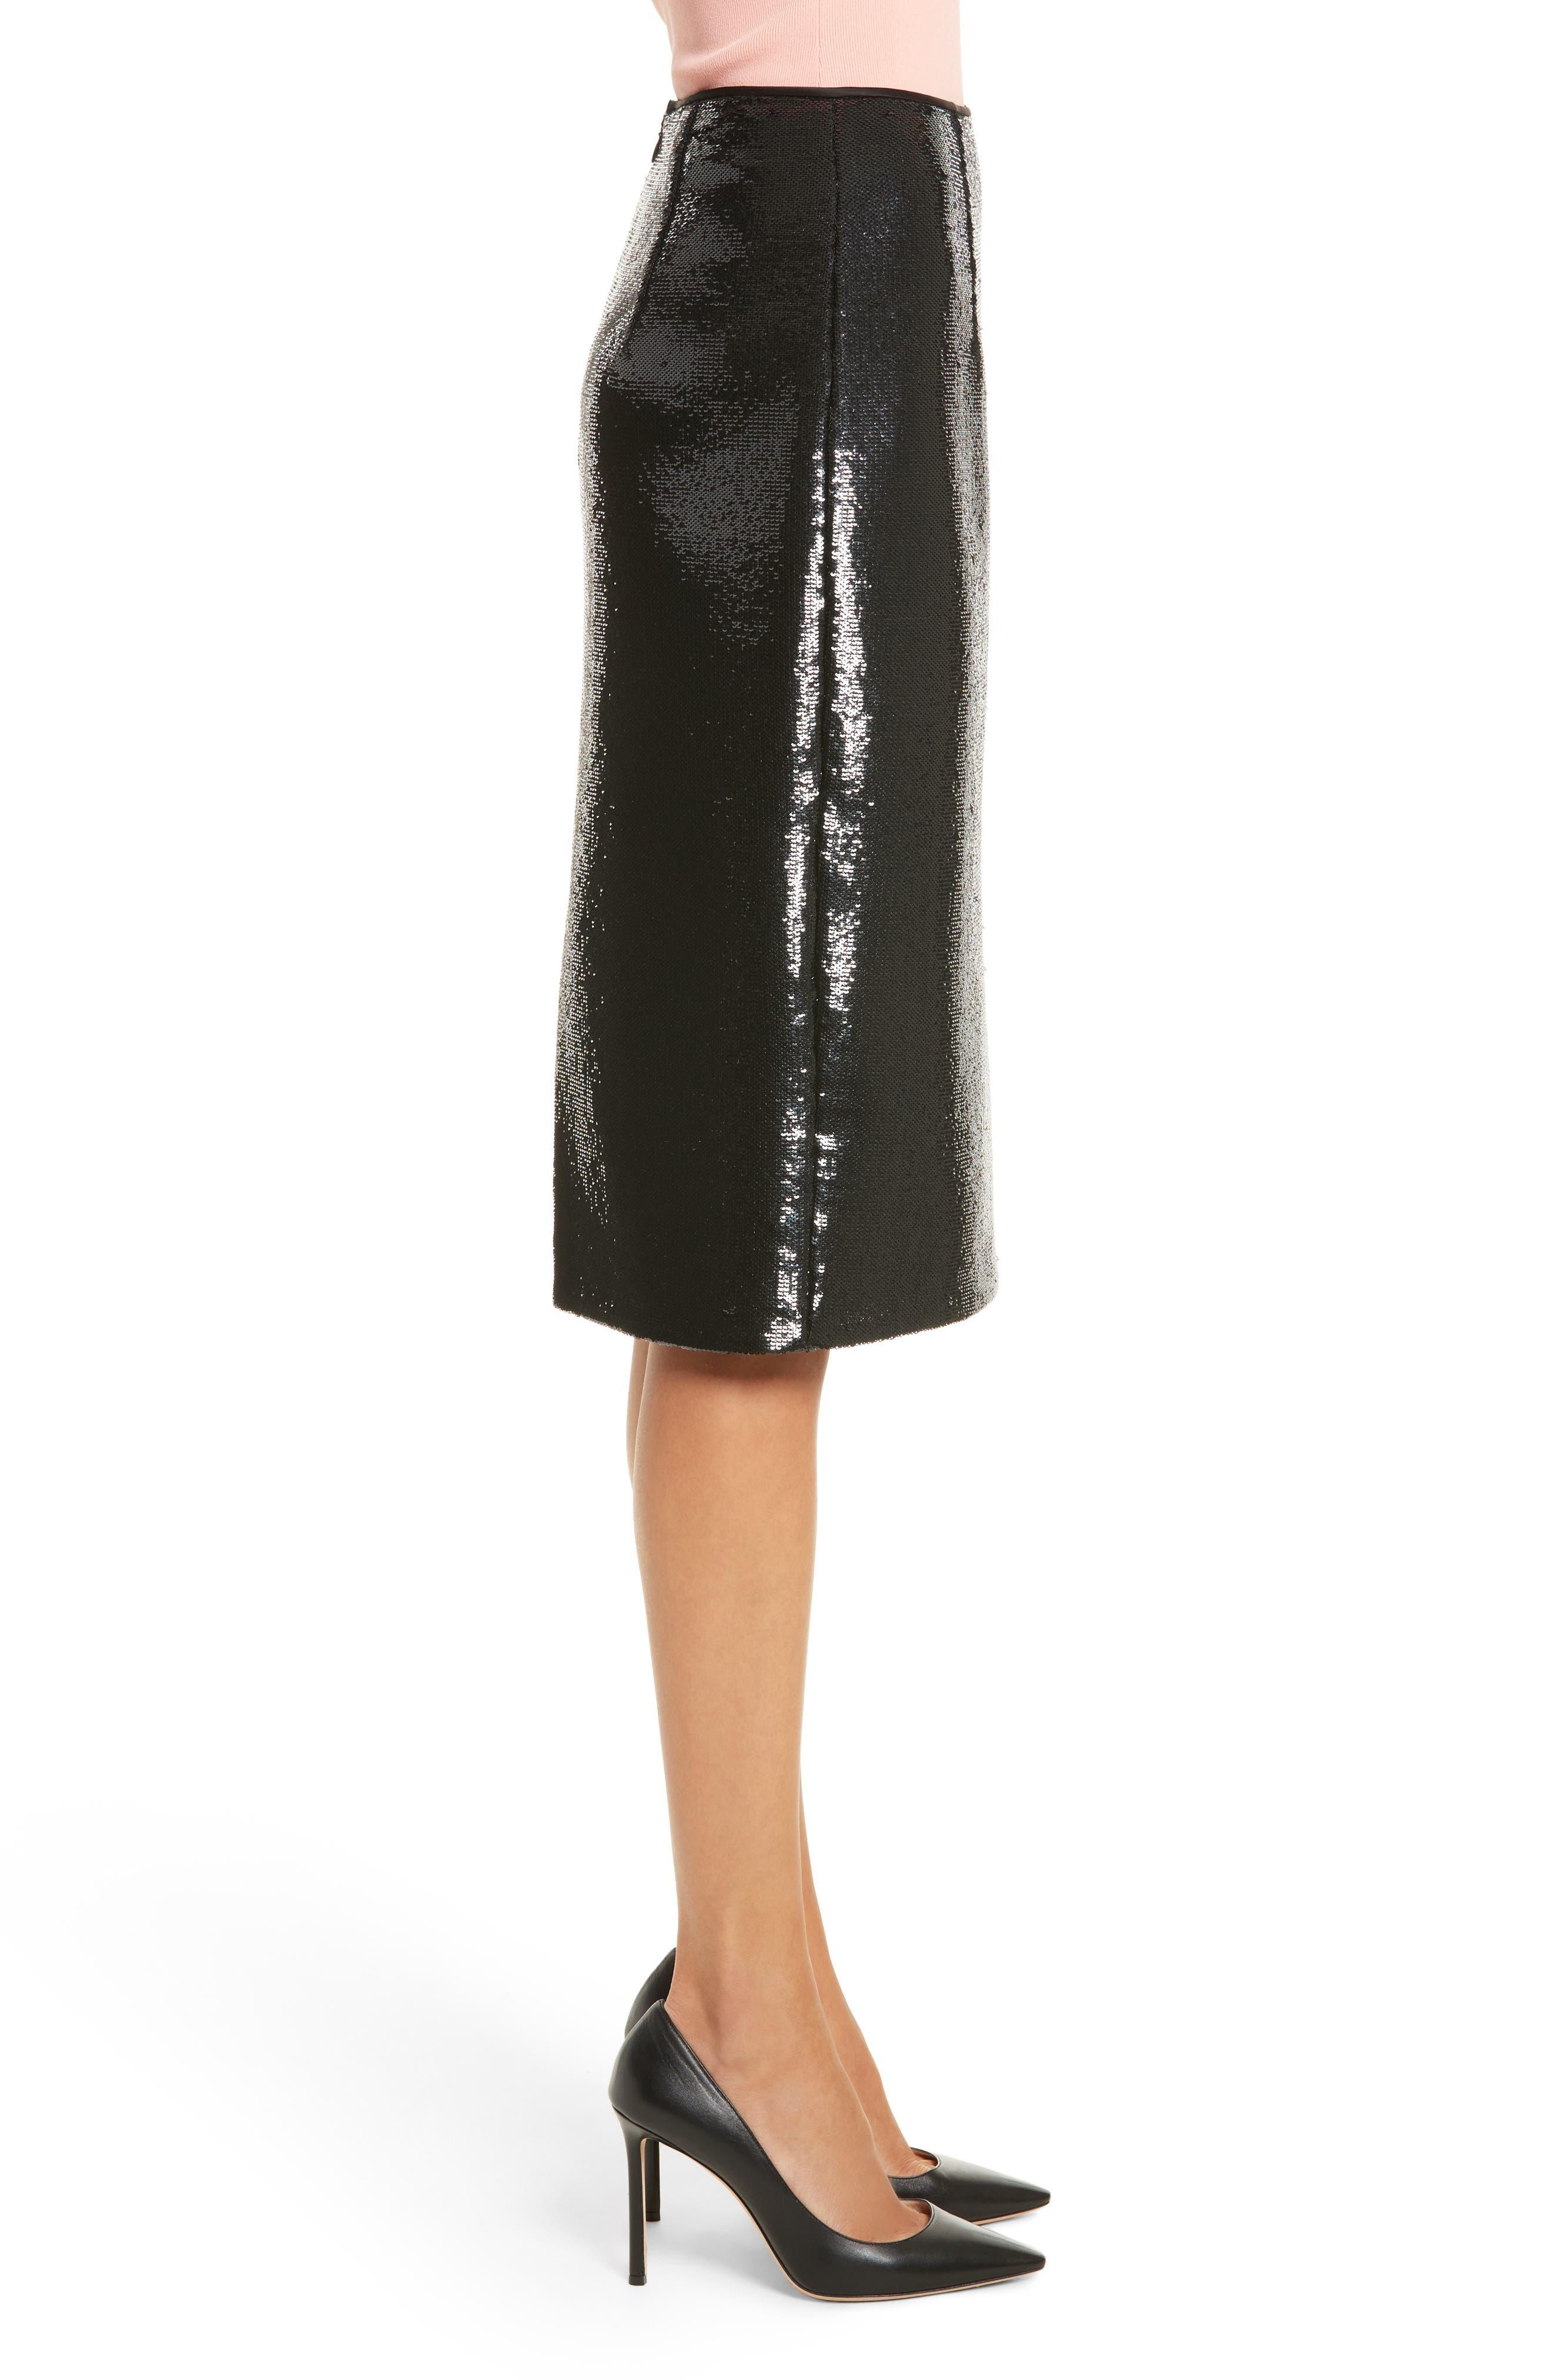 Diane von Furstenberg Sequin Pencil Skirt,                             Alternate thumbnail 3, color,                             001